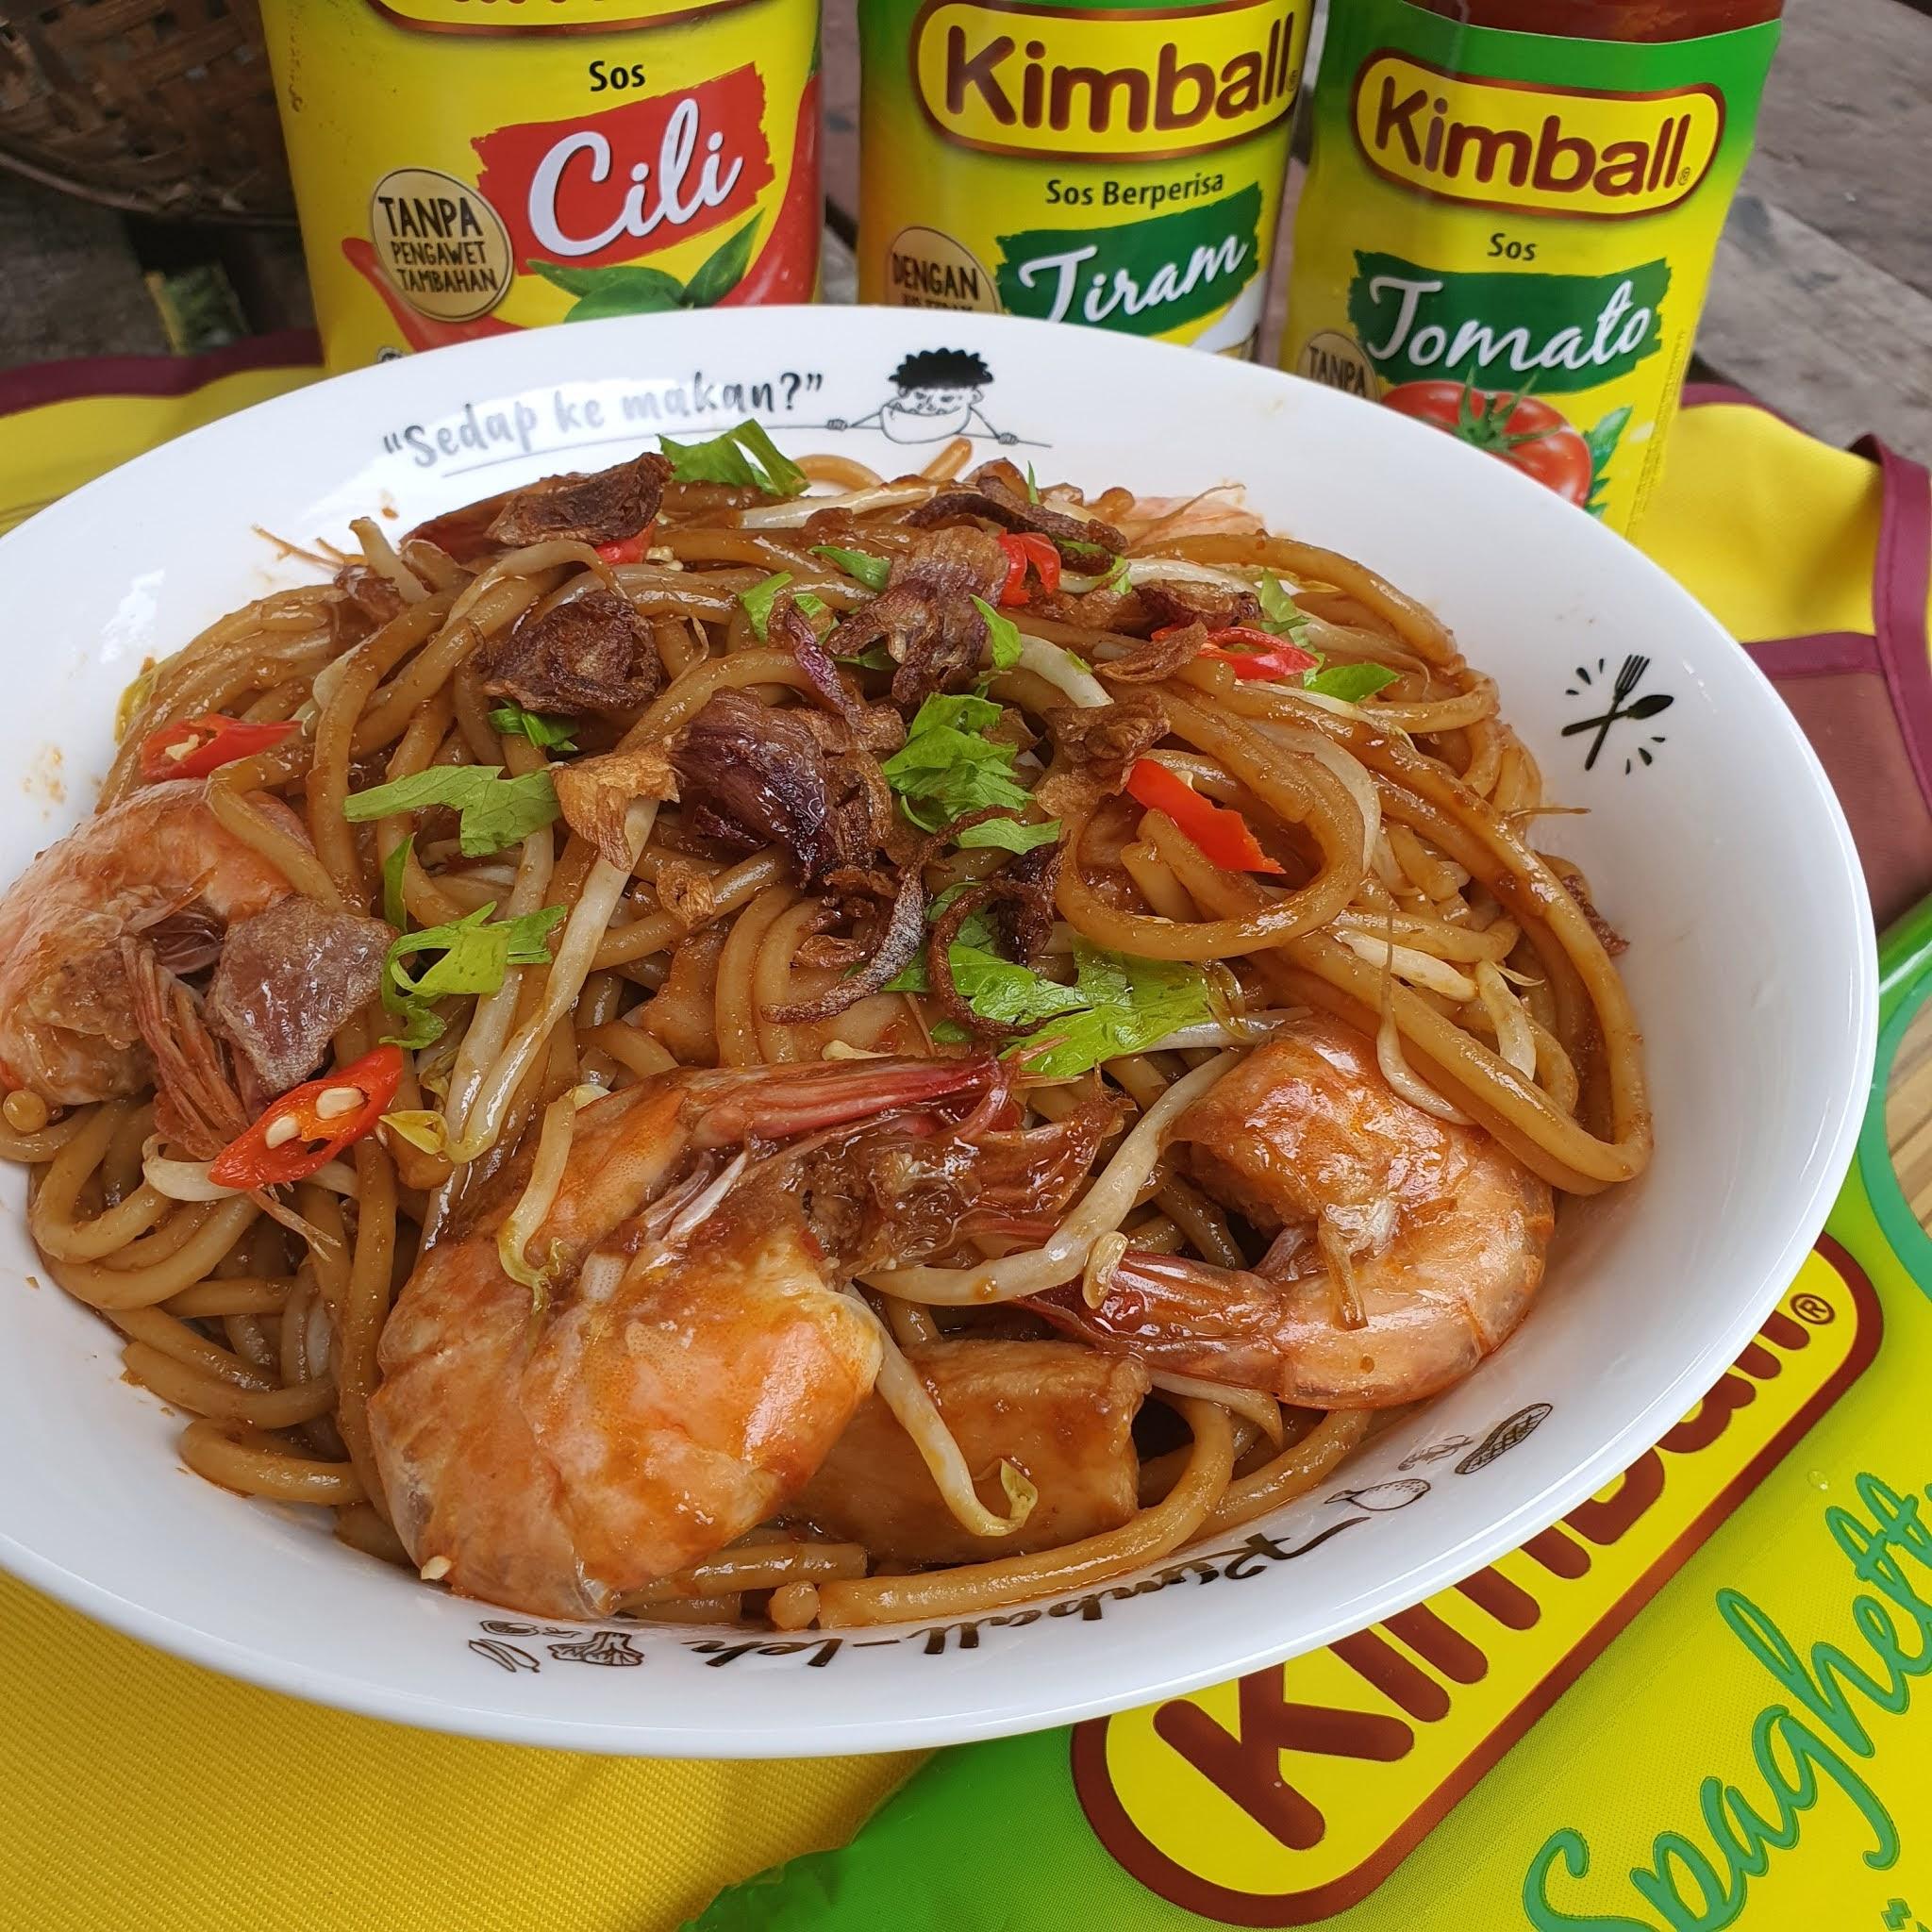 Fried spaghetti, resipi spaghetti goreng, spaghetti recipe, resipi spaghetti goreng mudah, resipi mee goreng, resipi kimball, barang kimball,